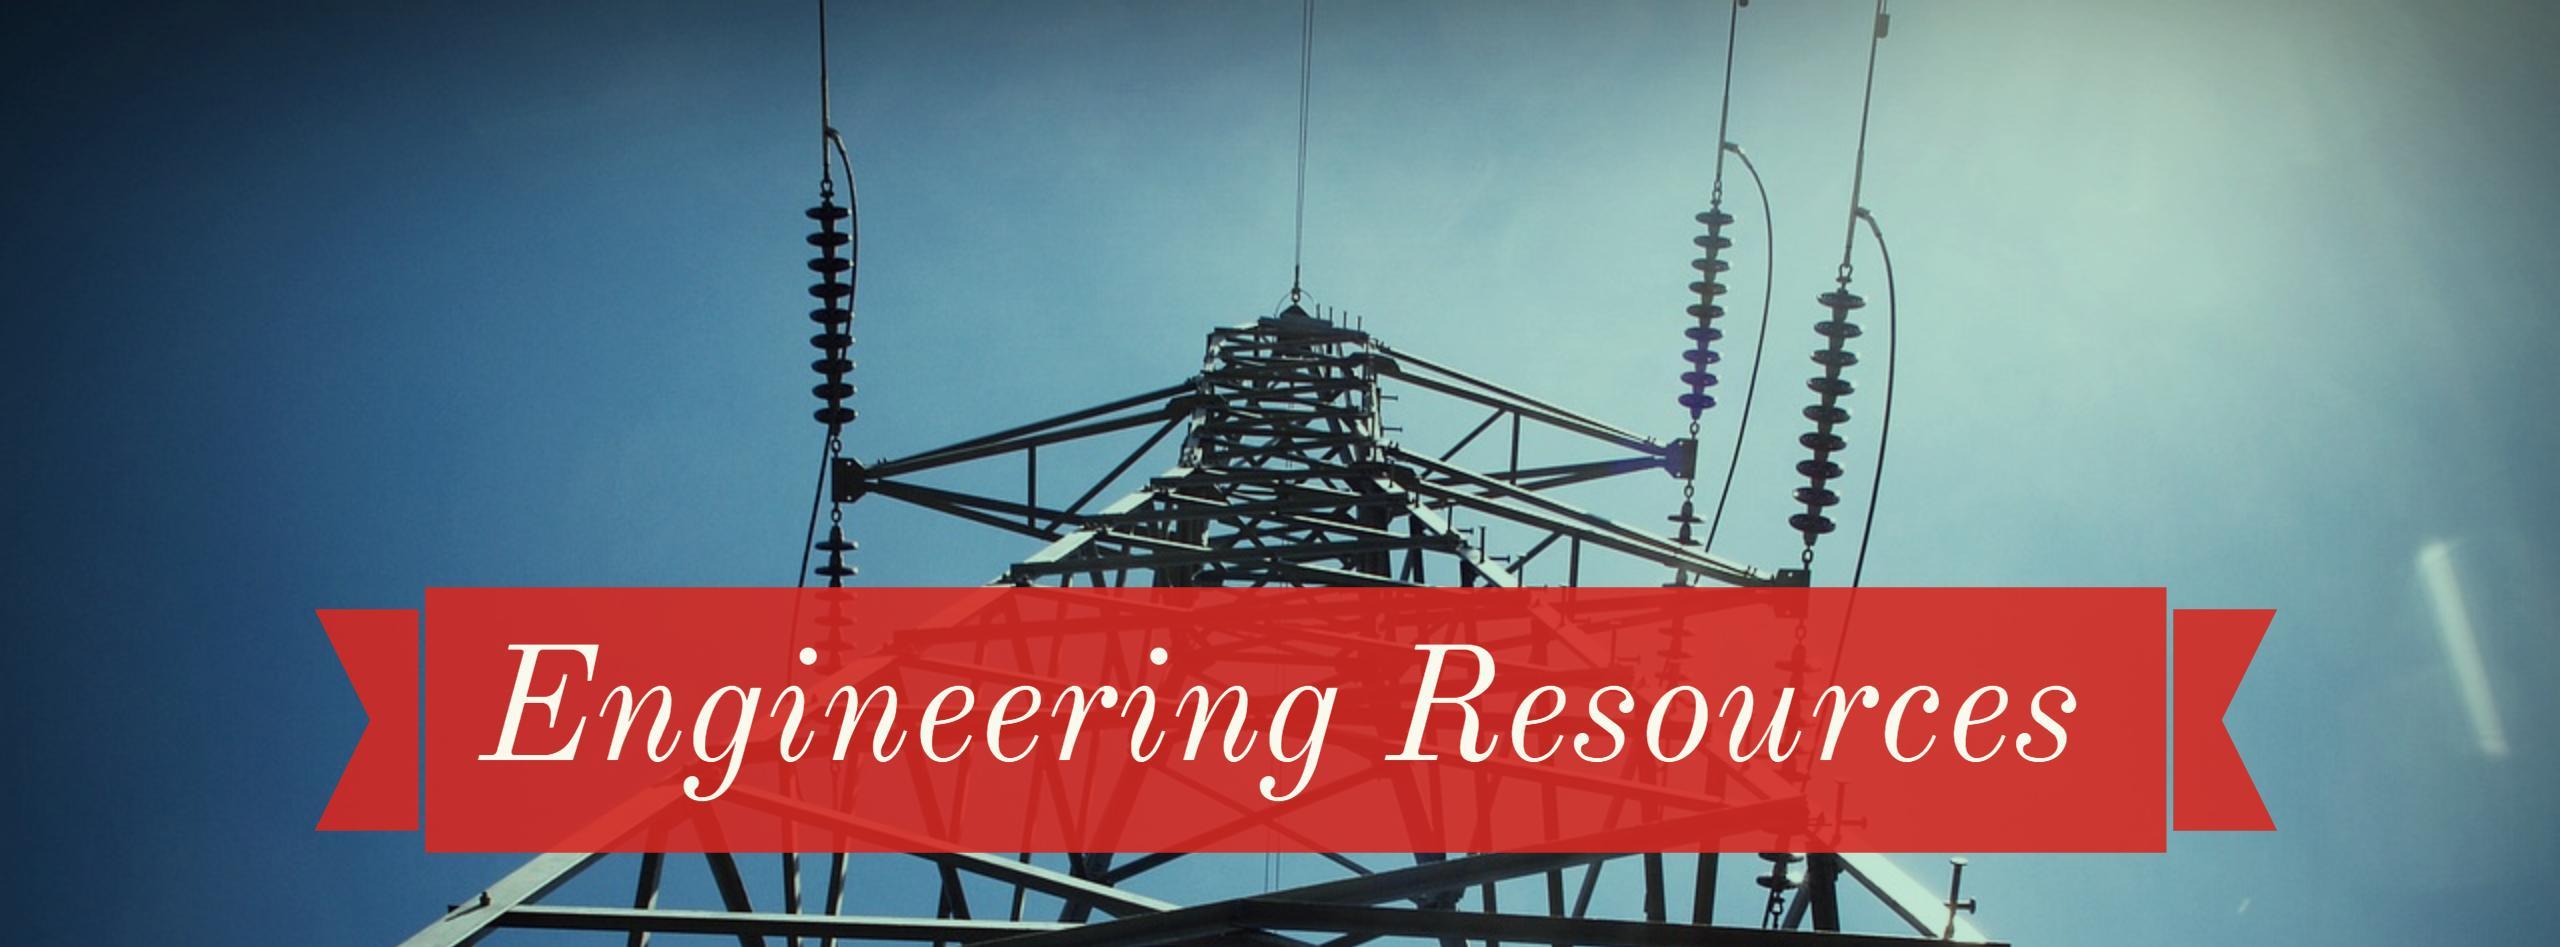 EngineeringResource.jpg